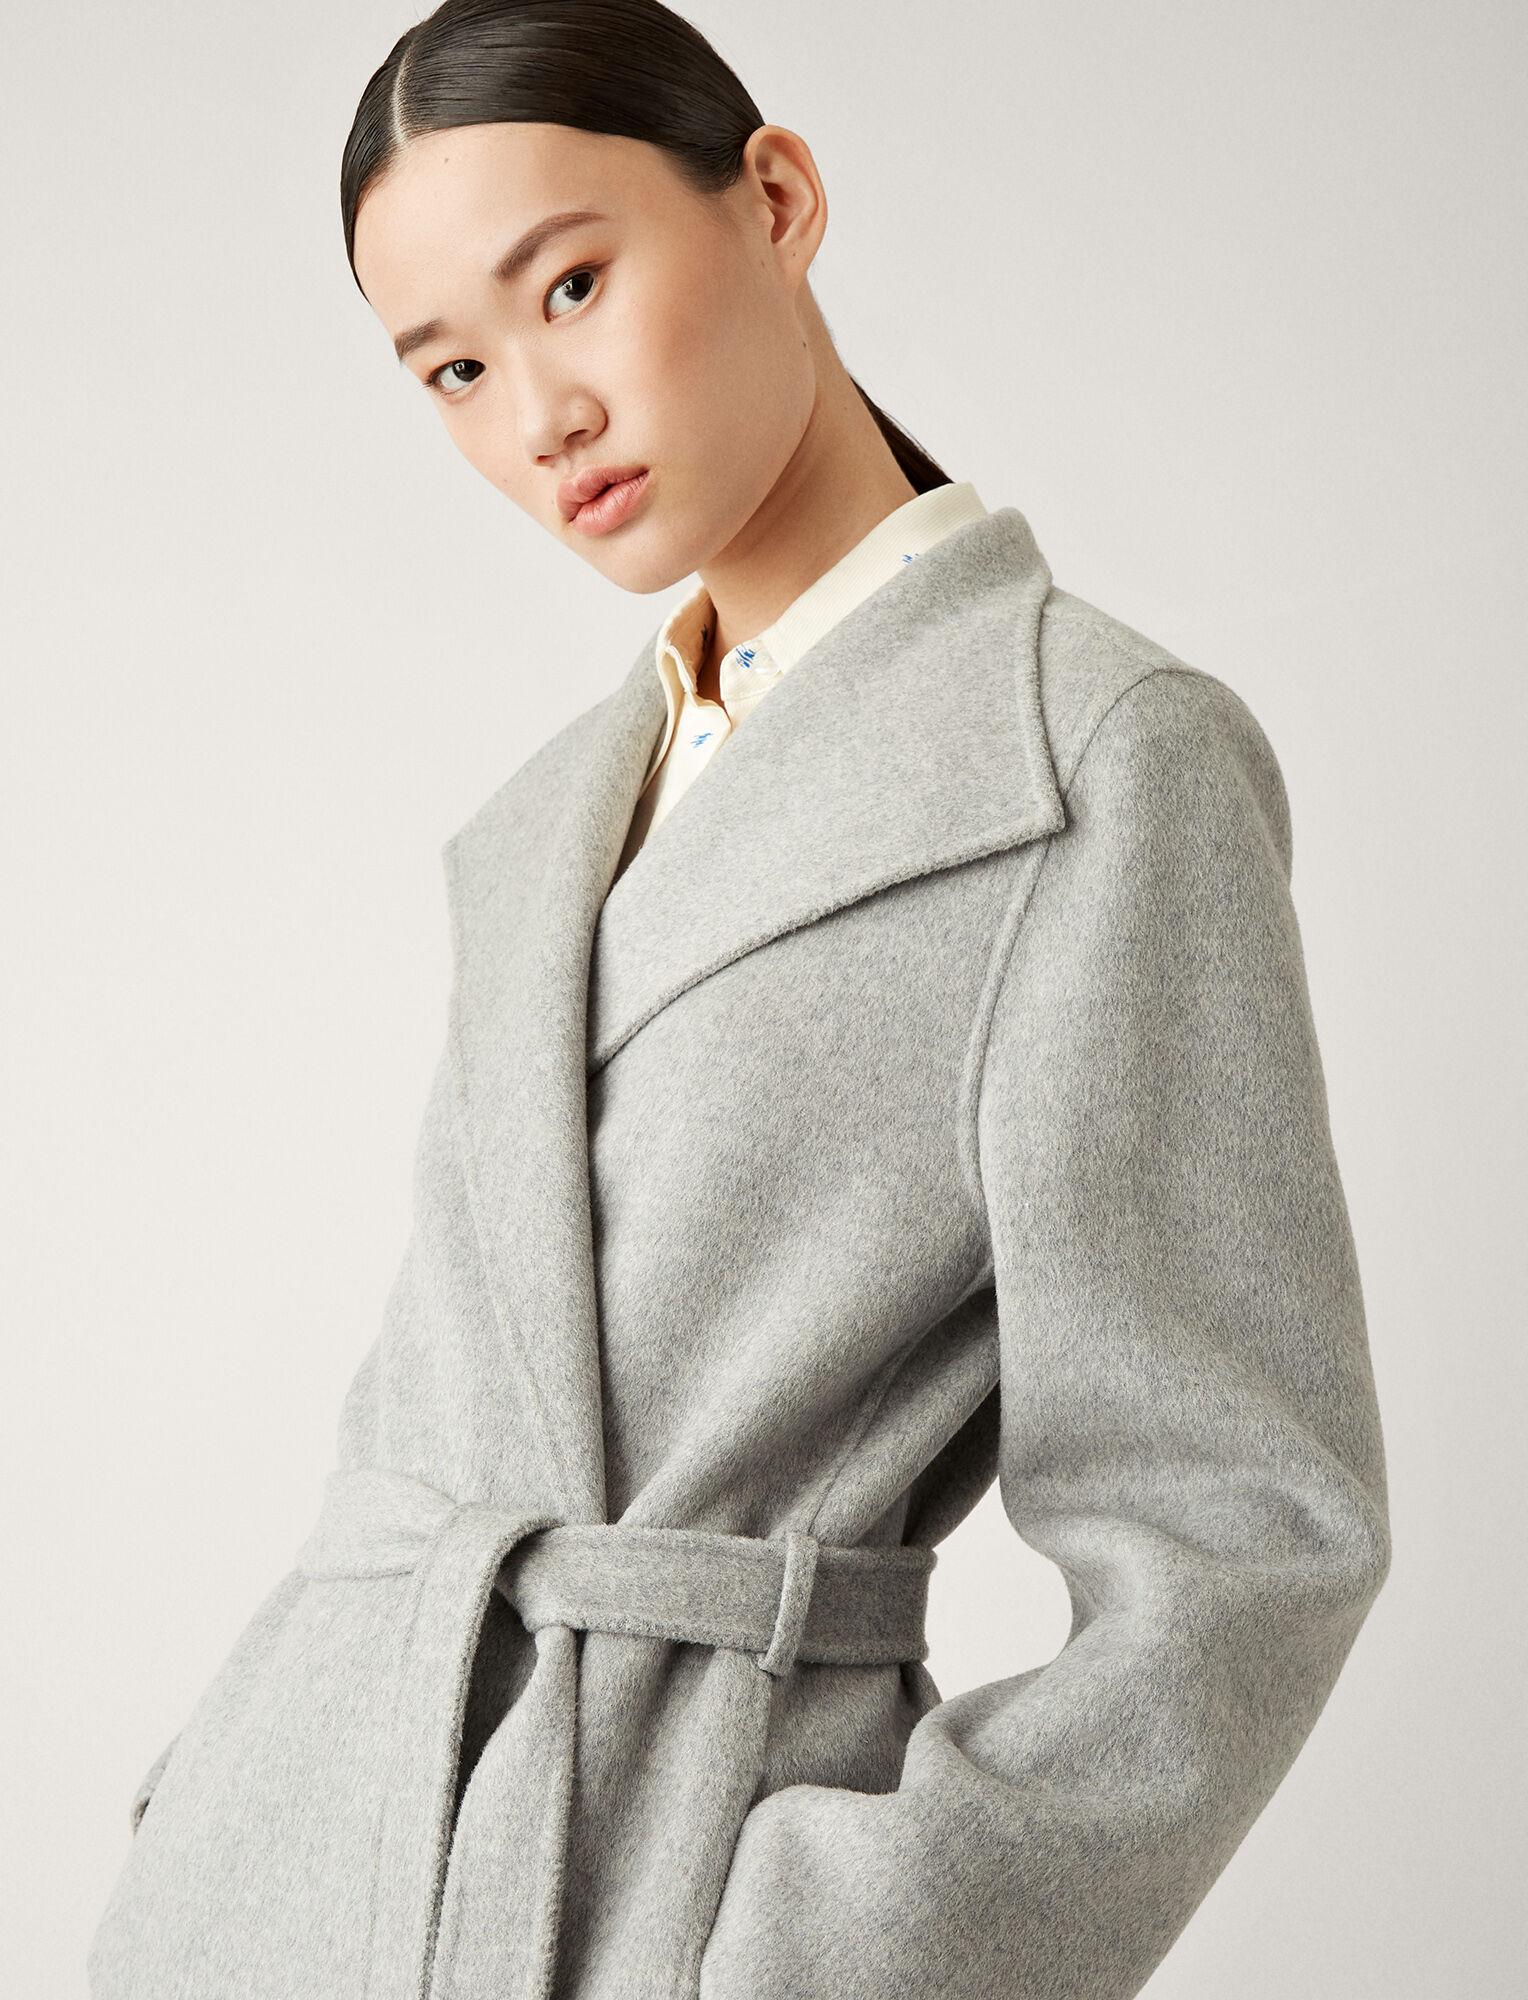 Joseph, Lima Double Face Cashmere Coat, in GREY